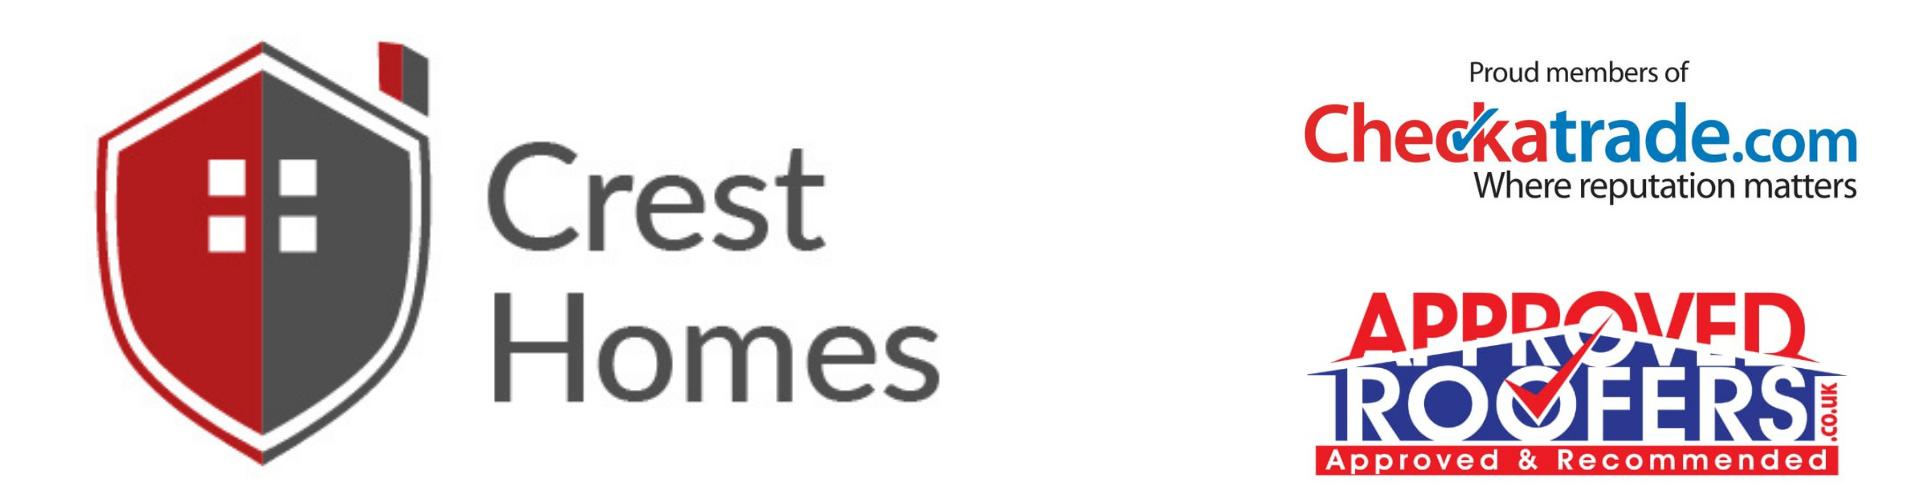 Crest Homes – 03300 229286